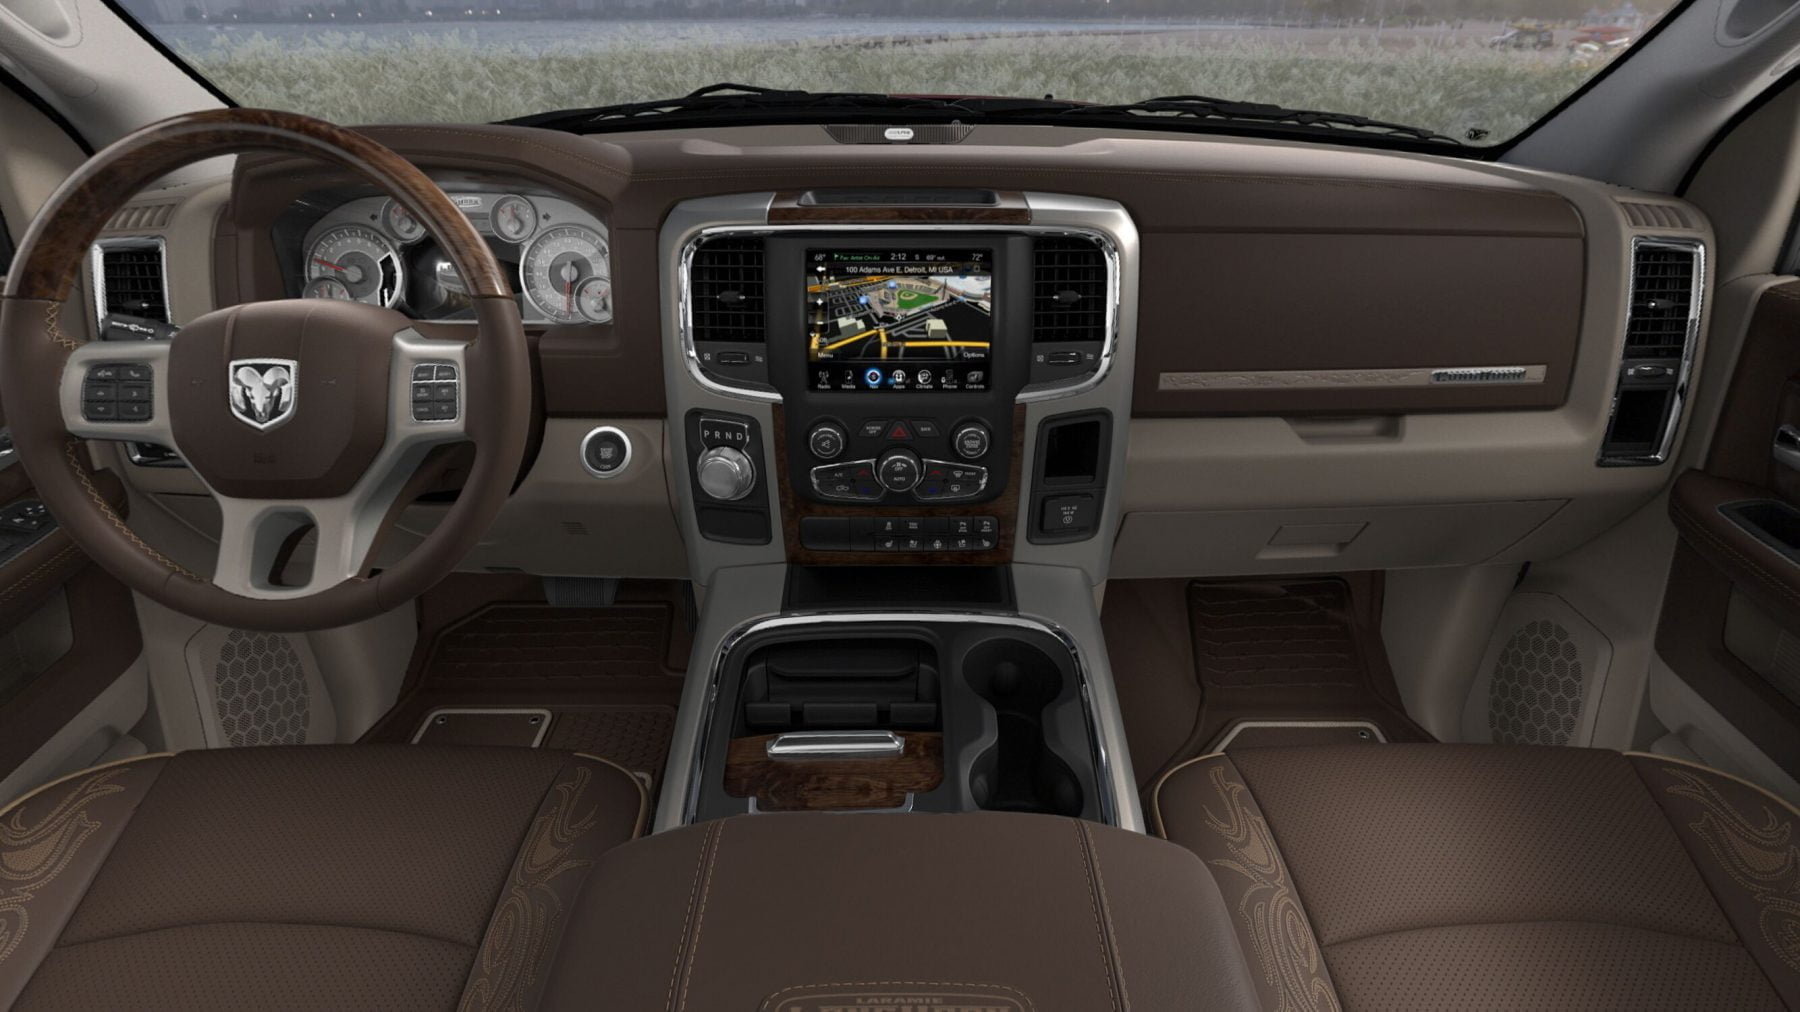 RAM 1500 interior seats longhorn